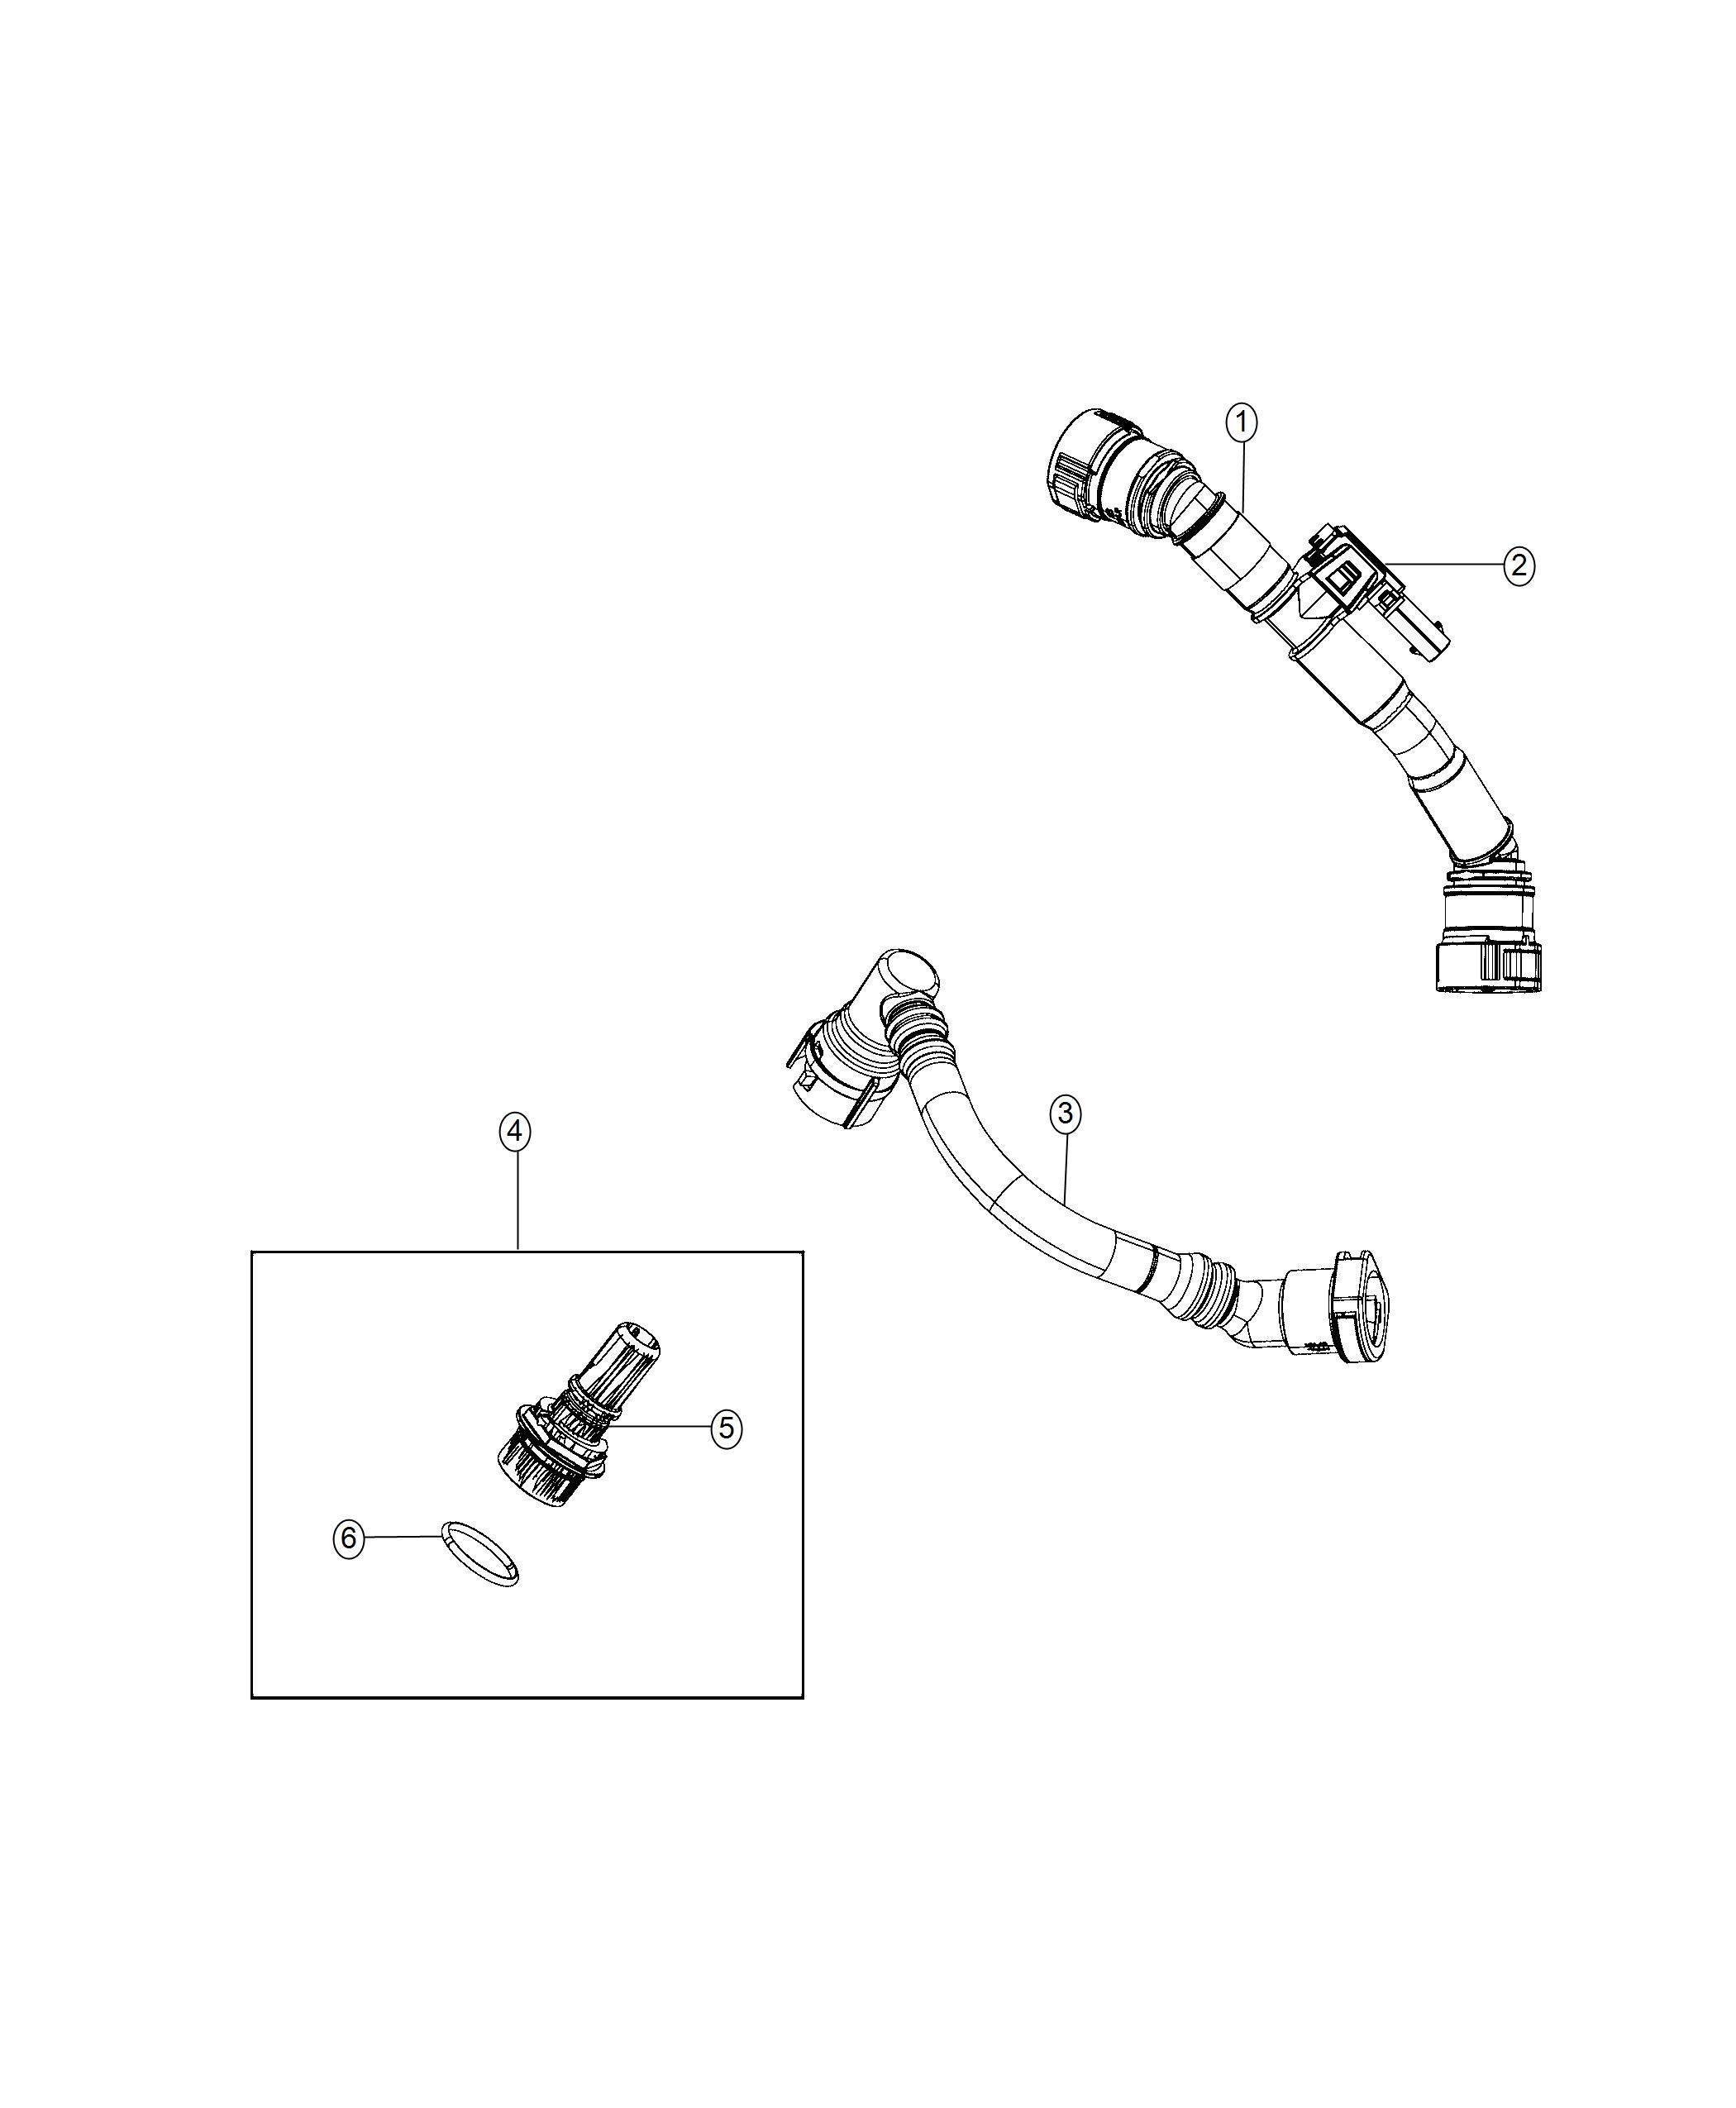 Jeep Grand Cherokee Sensor Air Pressure Use Up To 4